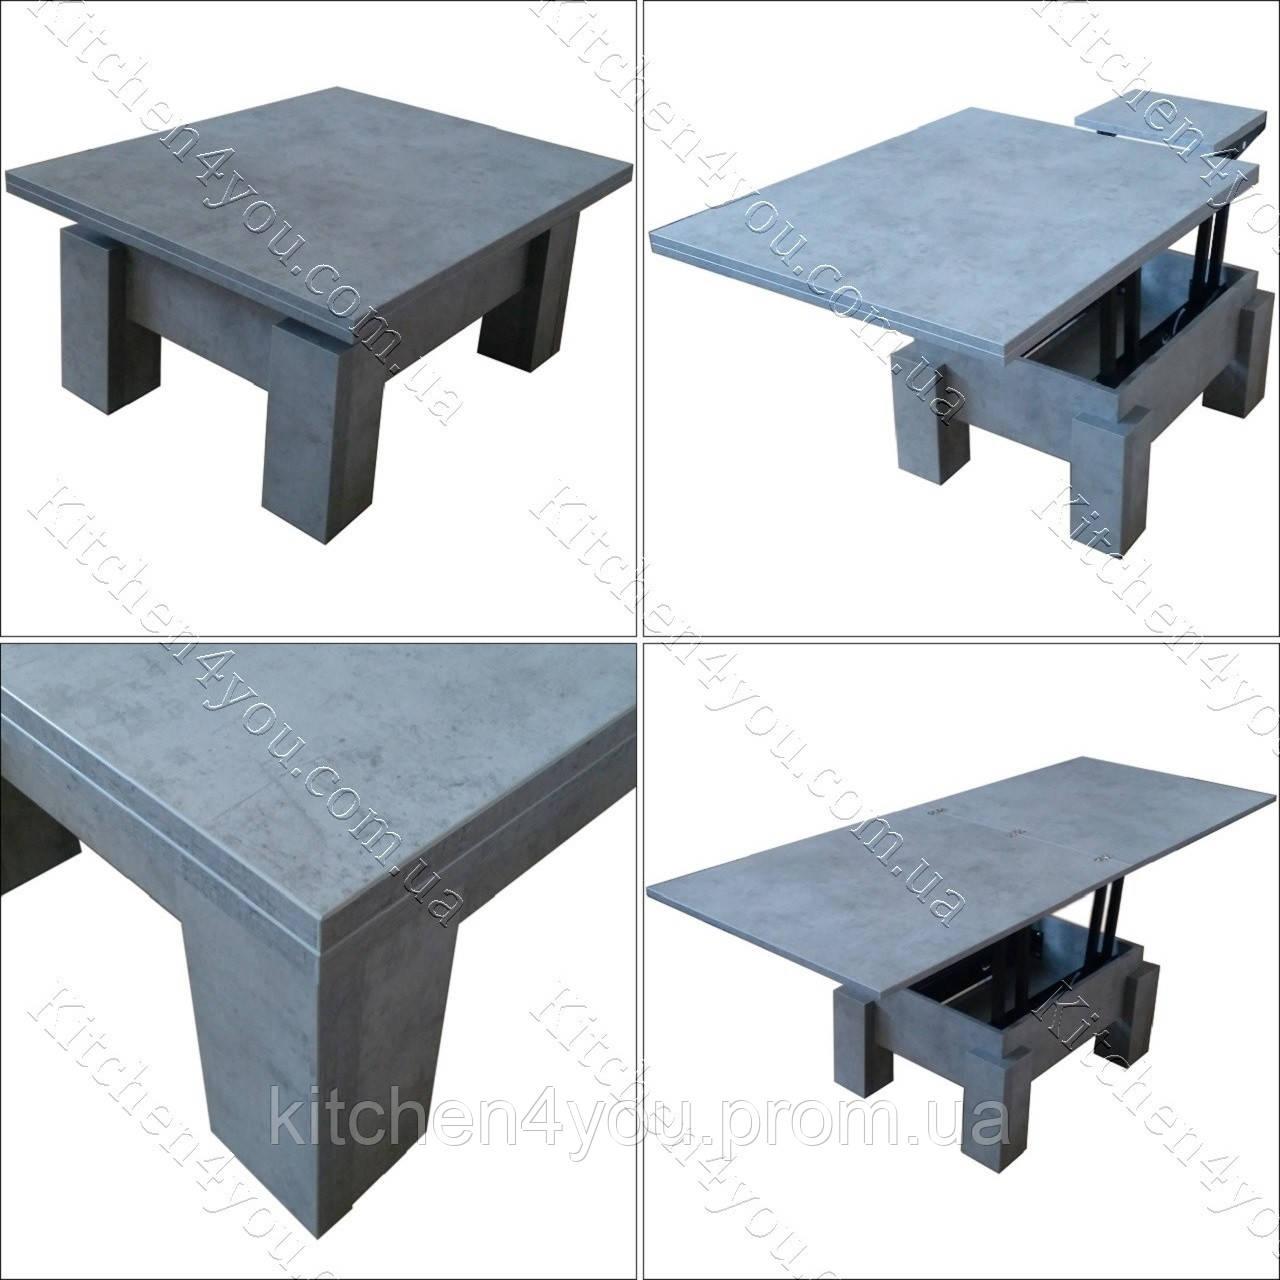 Стол-трансформер Optimus бетон Чикаго светло-серый